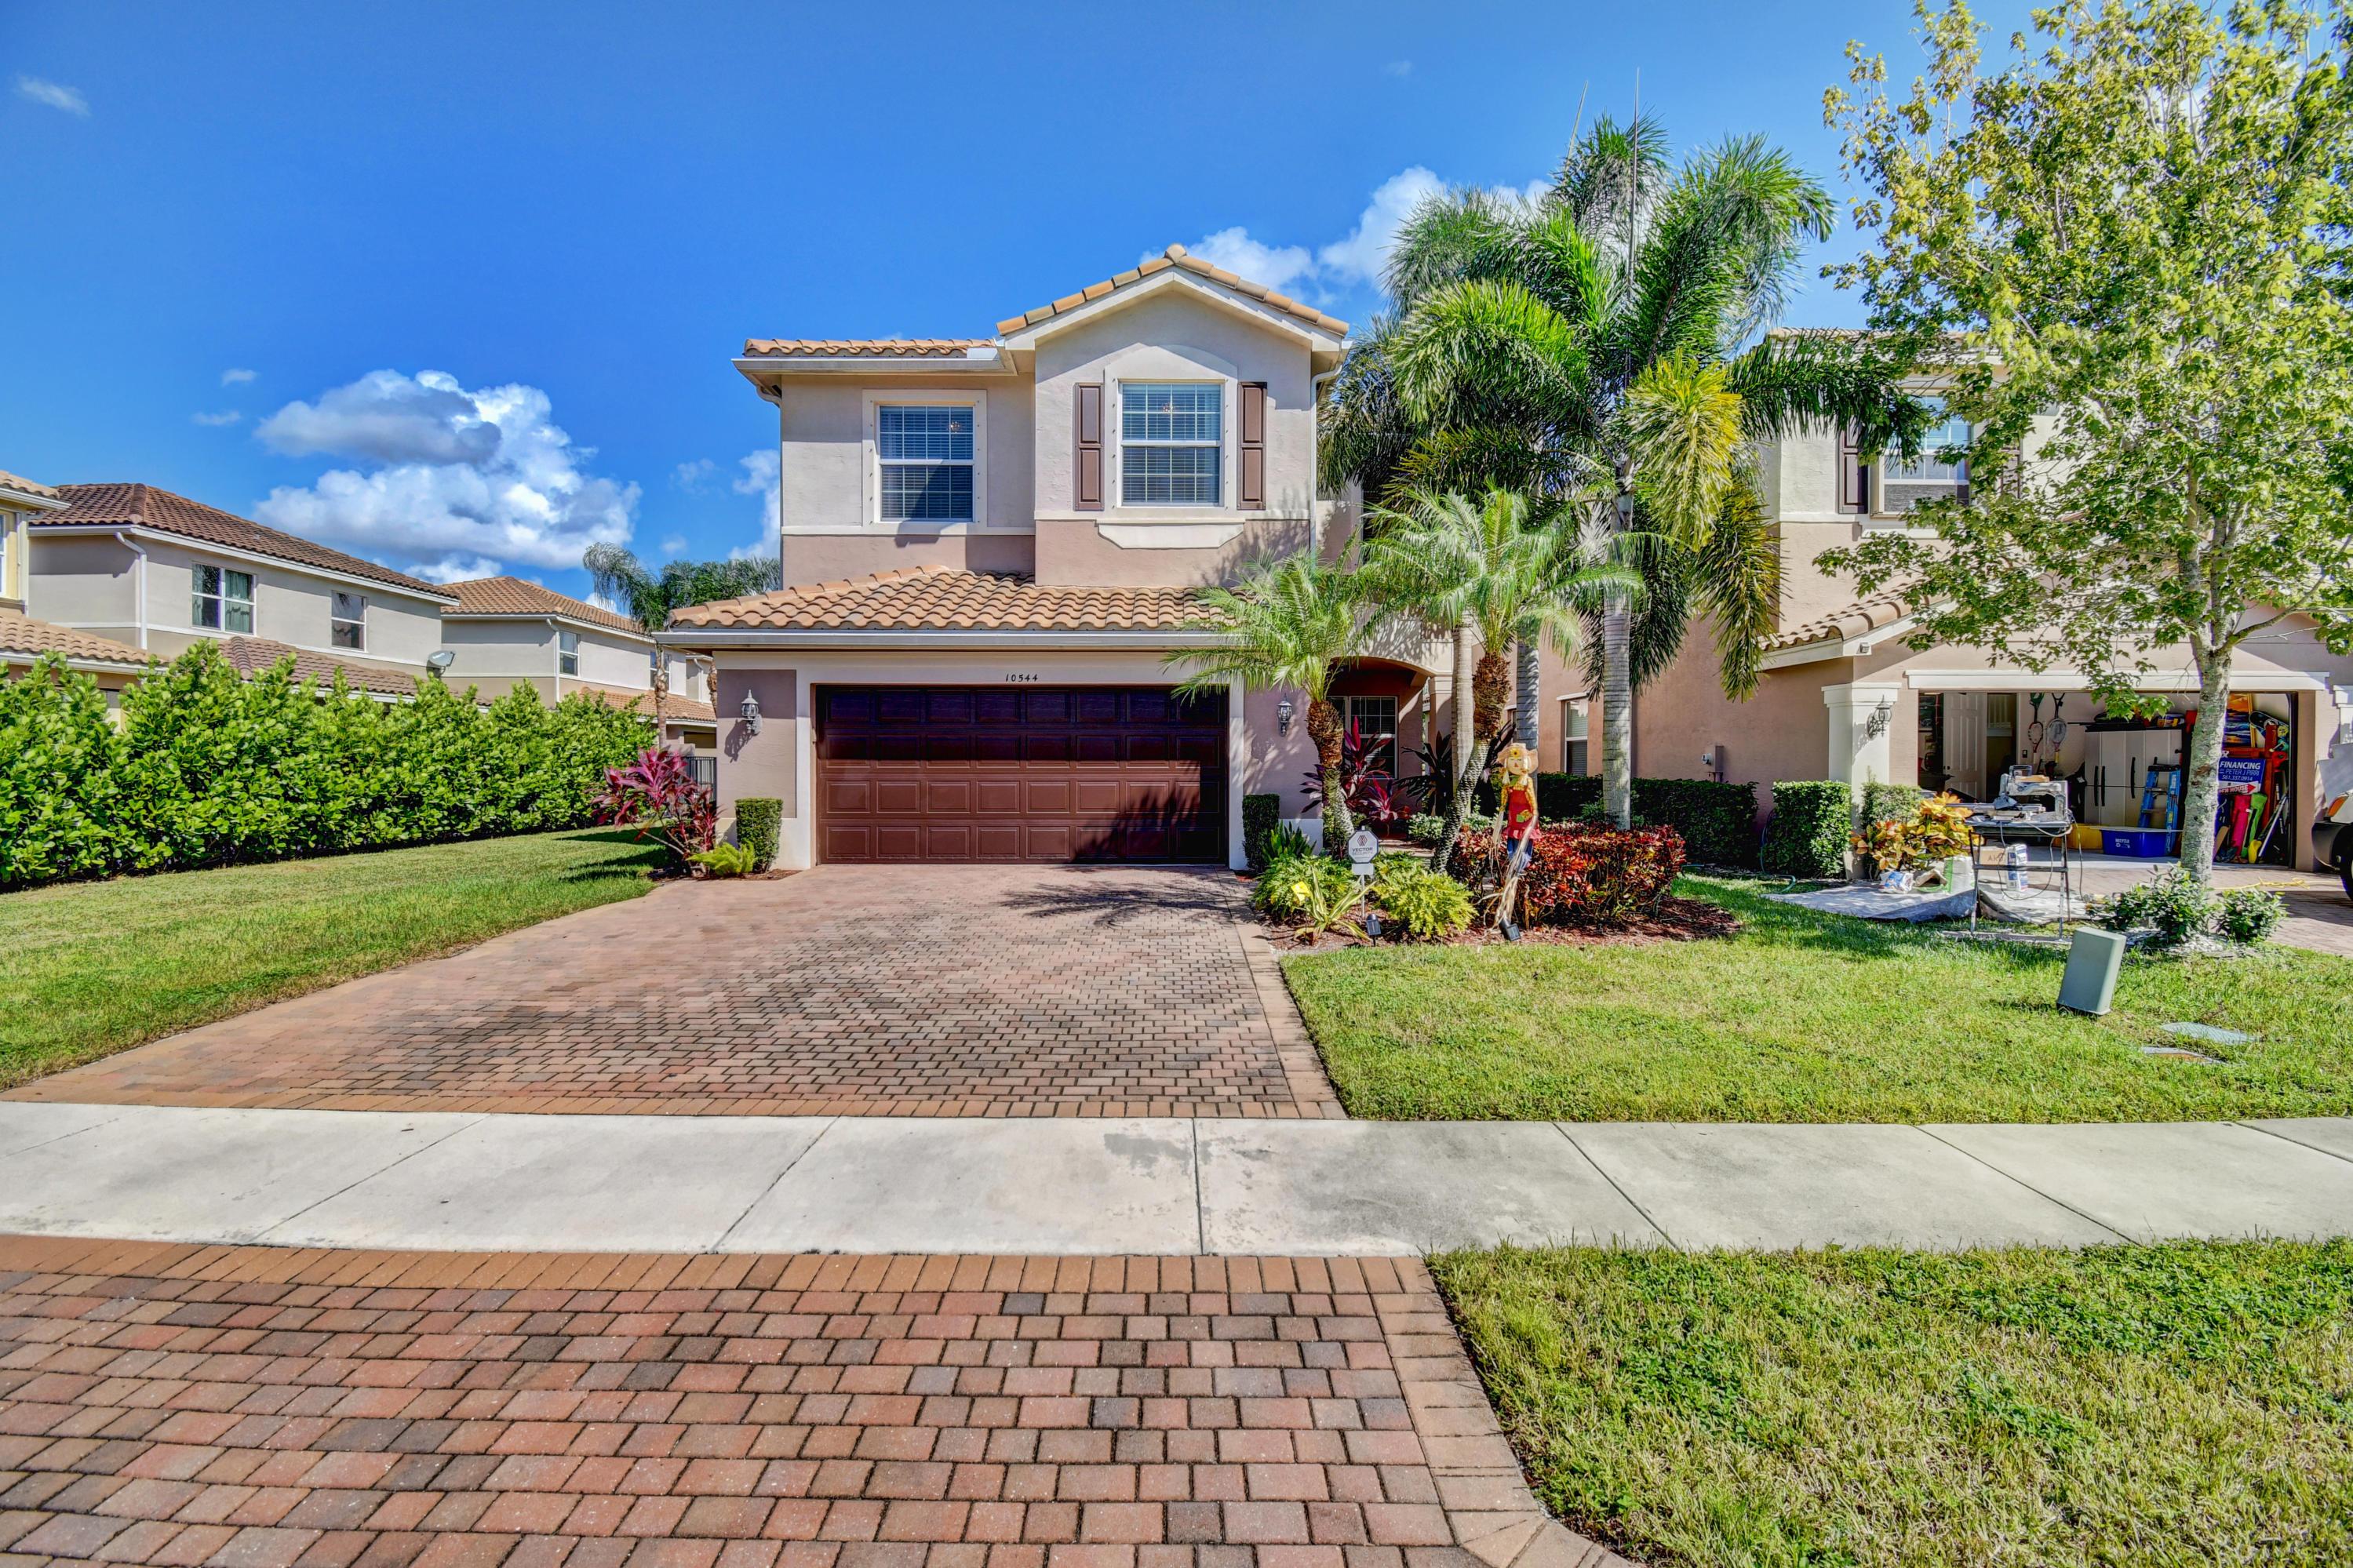 10544 Cape Delabra Court Boynton Beach, FL 33473